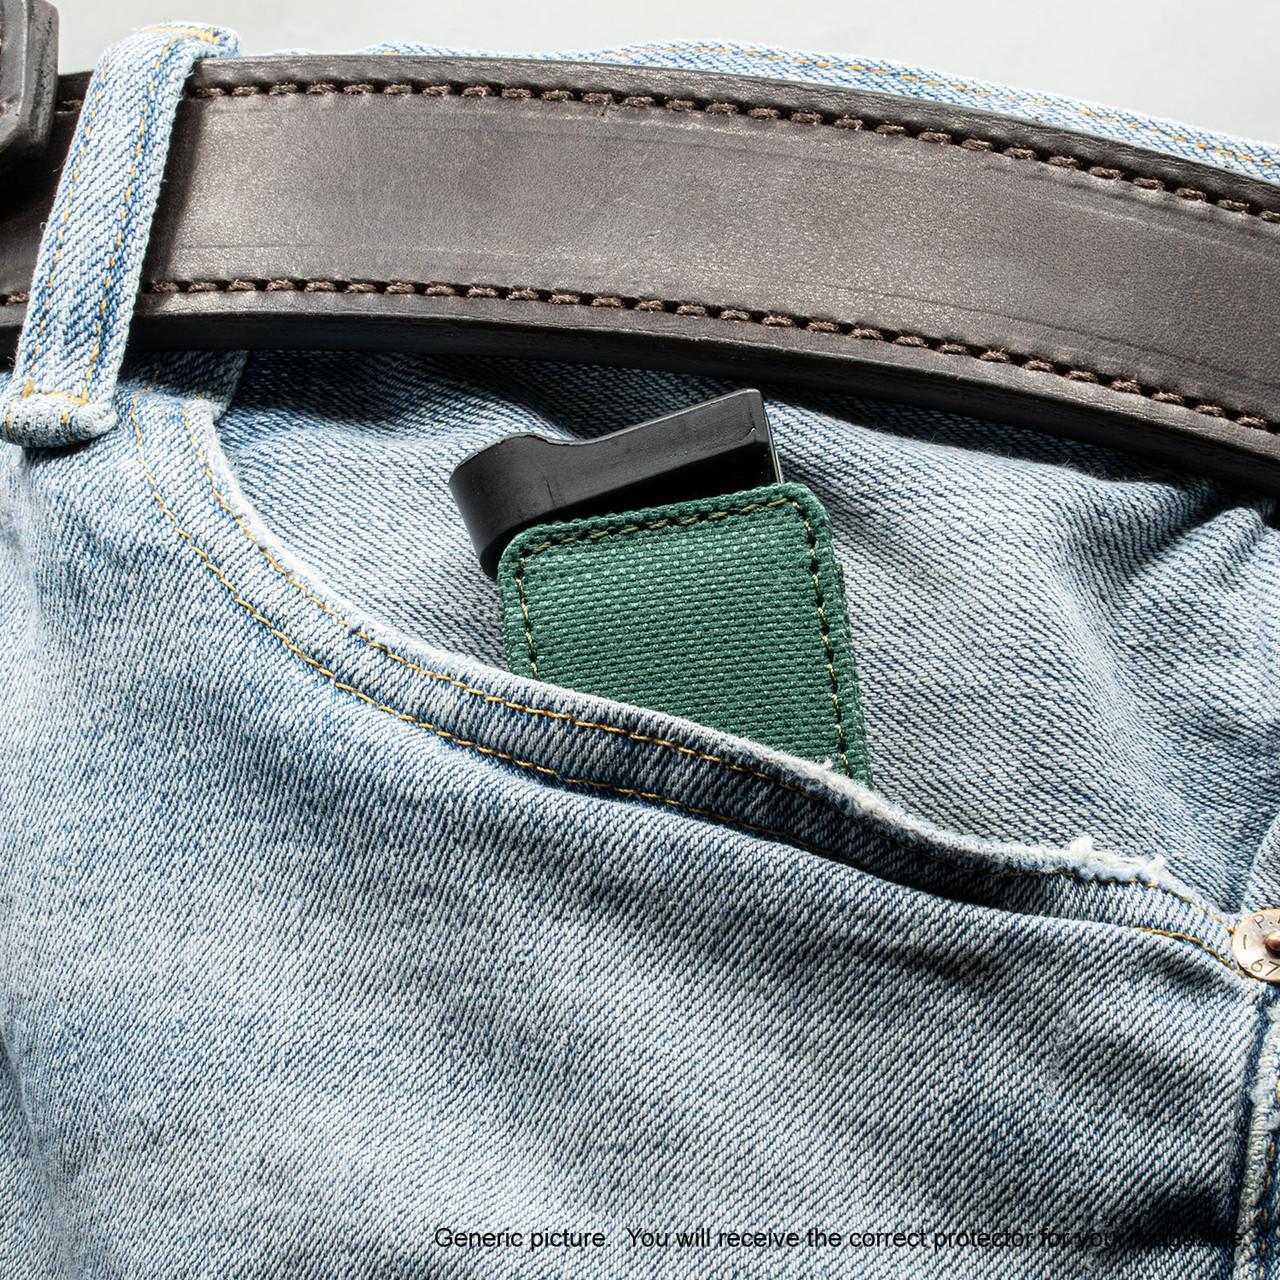 Beretta APX Green Covert Magazine Pocket Protector